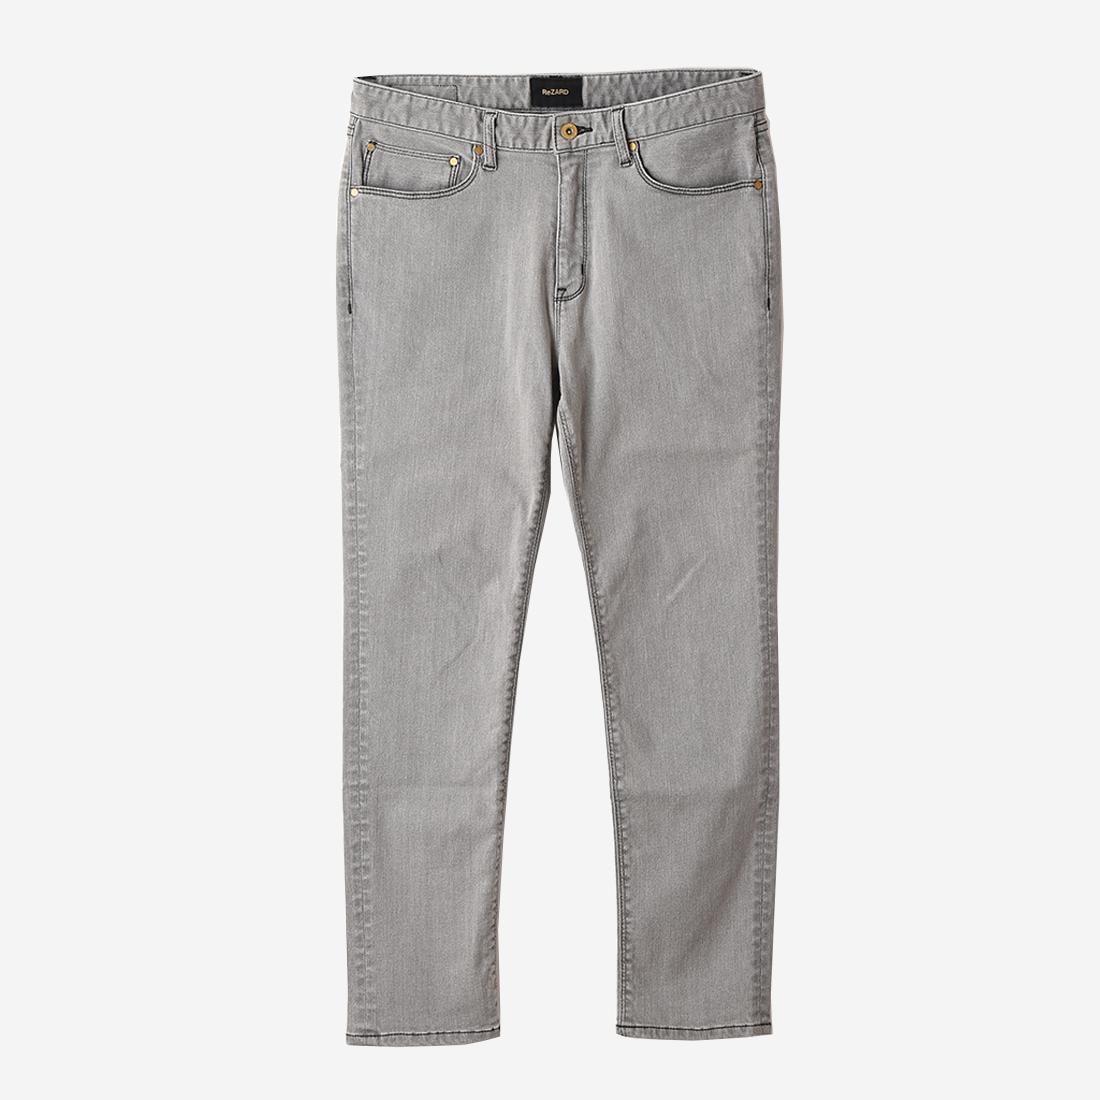 【ReZARD】New Logo Stretch Fit Pants